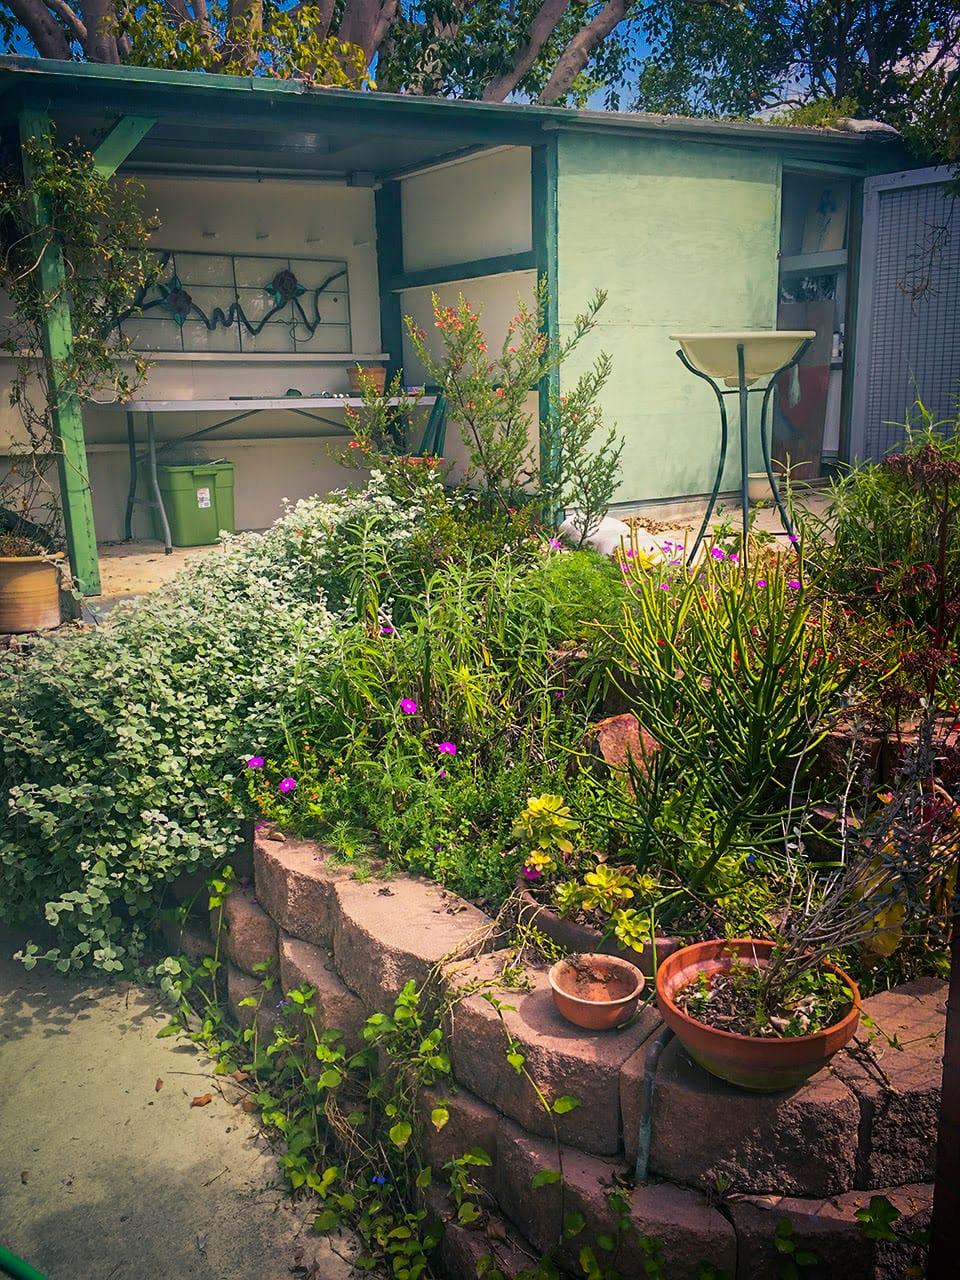 My studio in my sister's garden in Solana Beach.